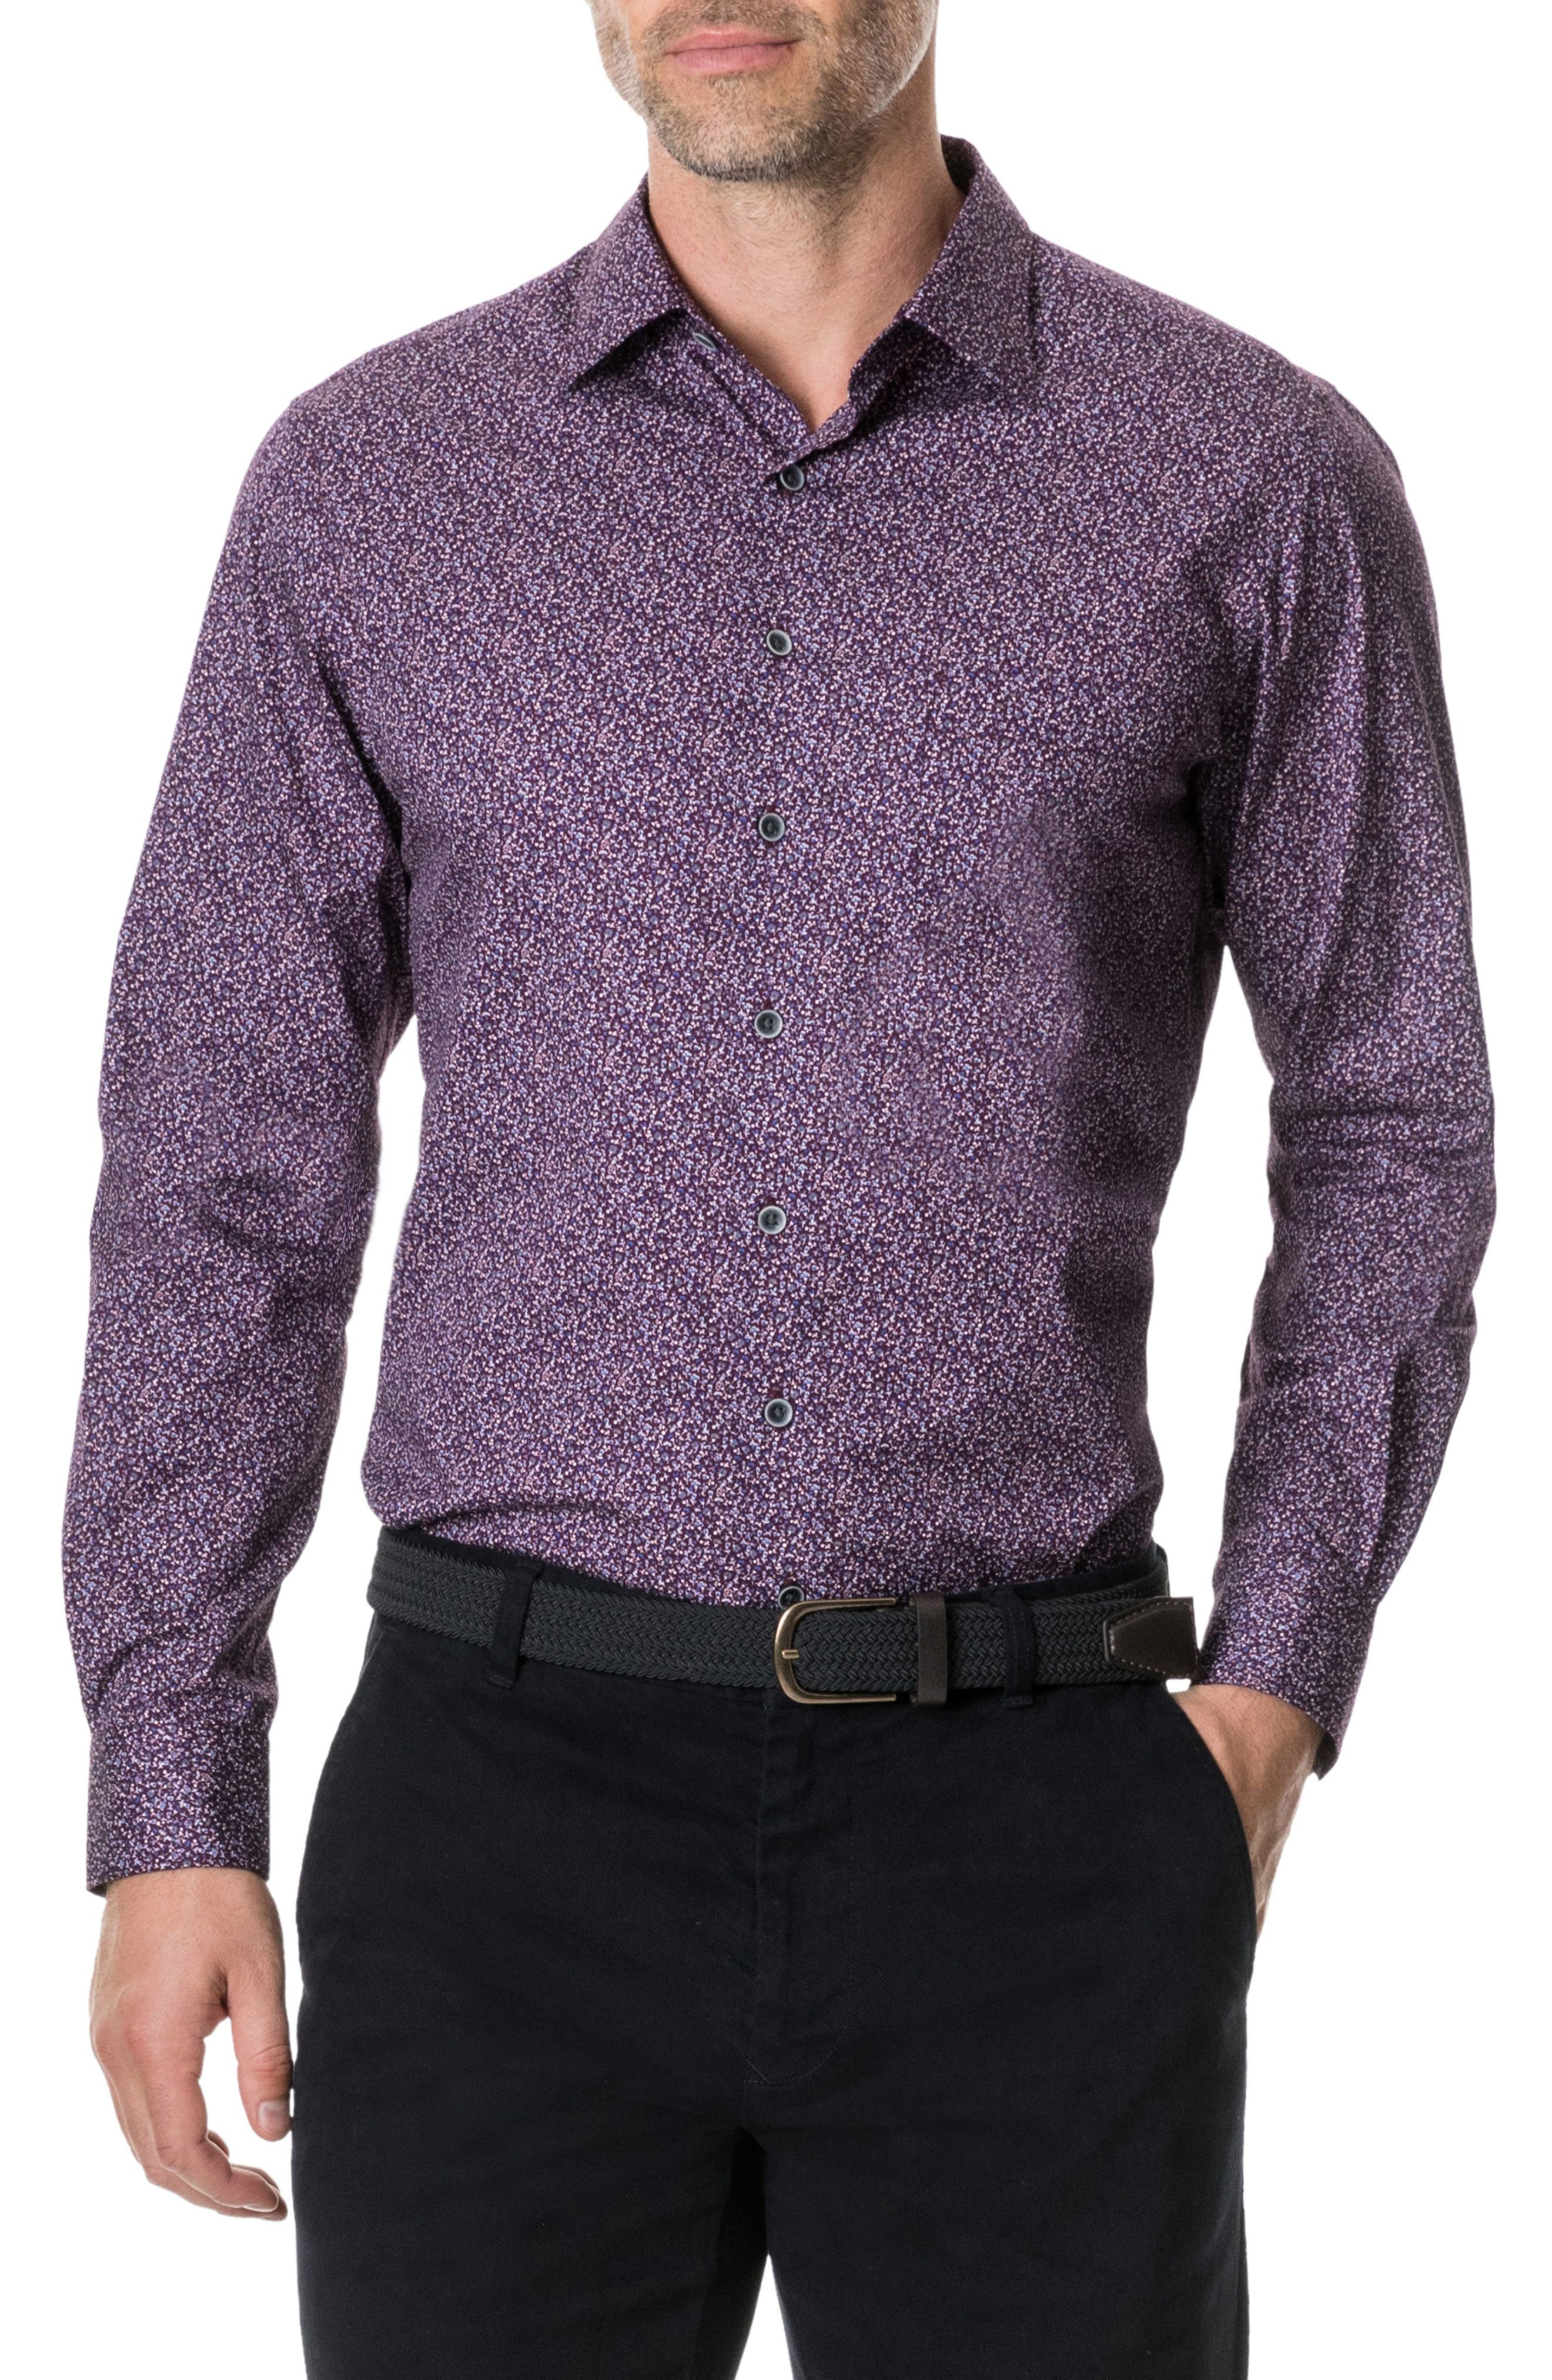 RODD & GUNN, Scotland Street Regular Fit Floral Sport Shirt, Main thumbnail 1, color, PLUM PURPLE